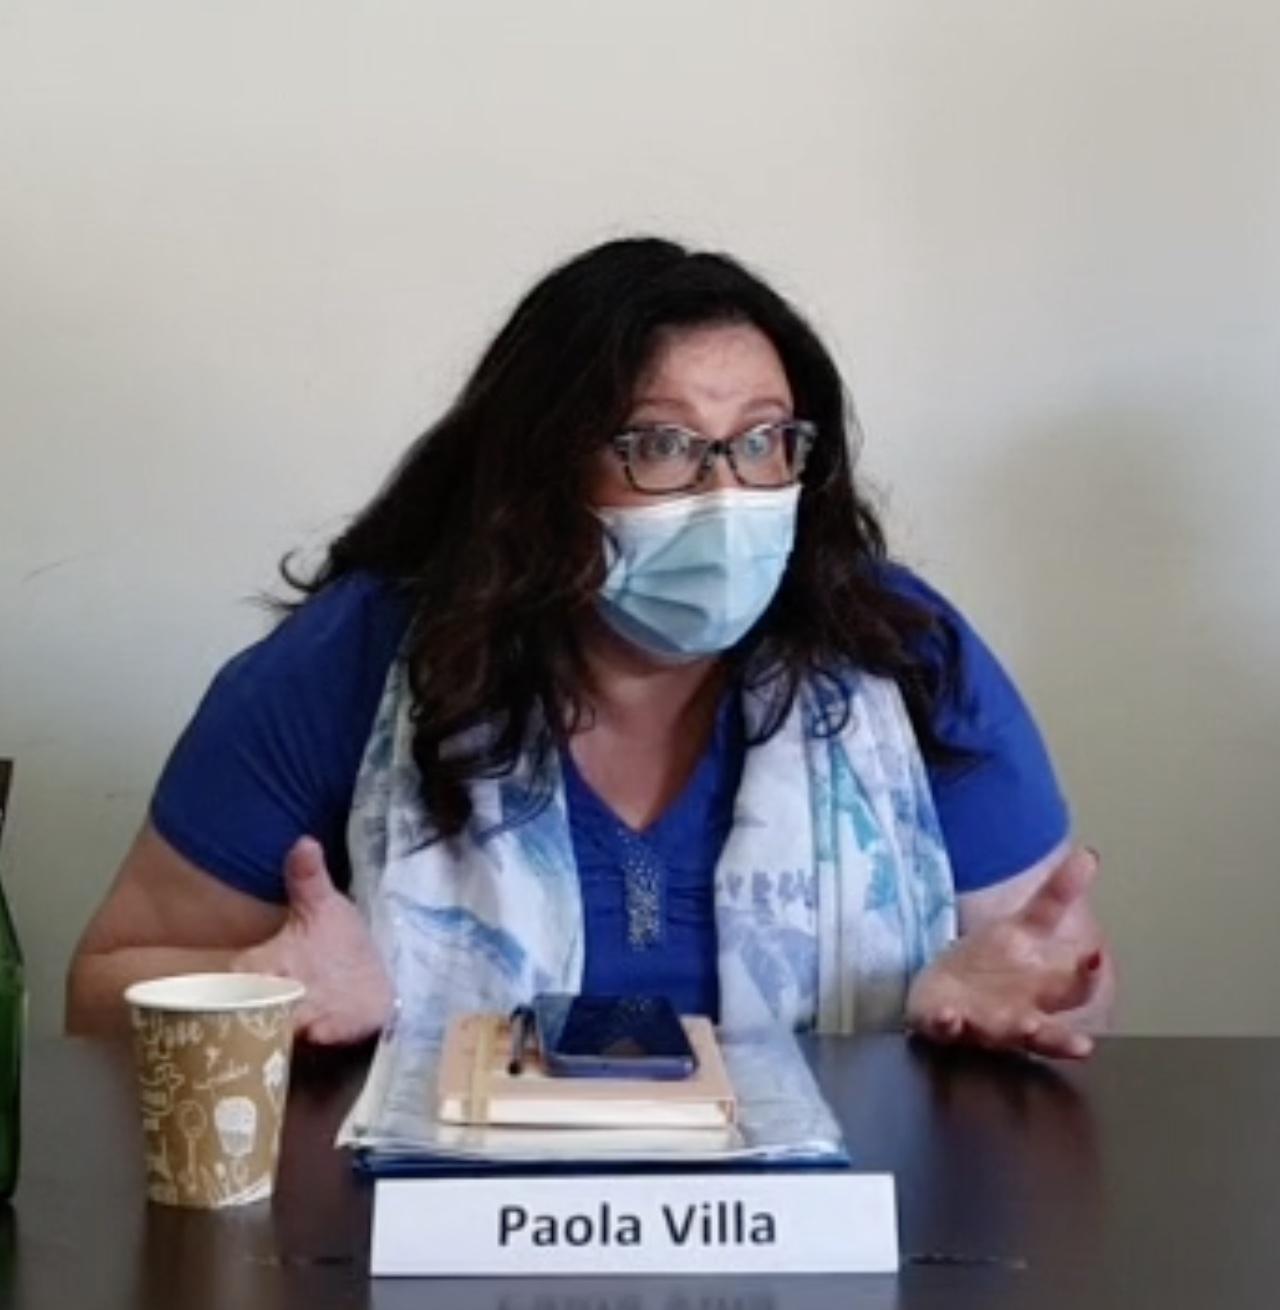 Paiola Villa